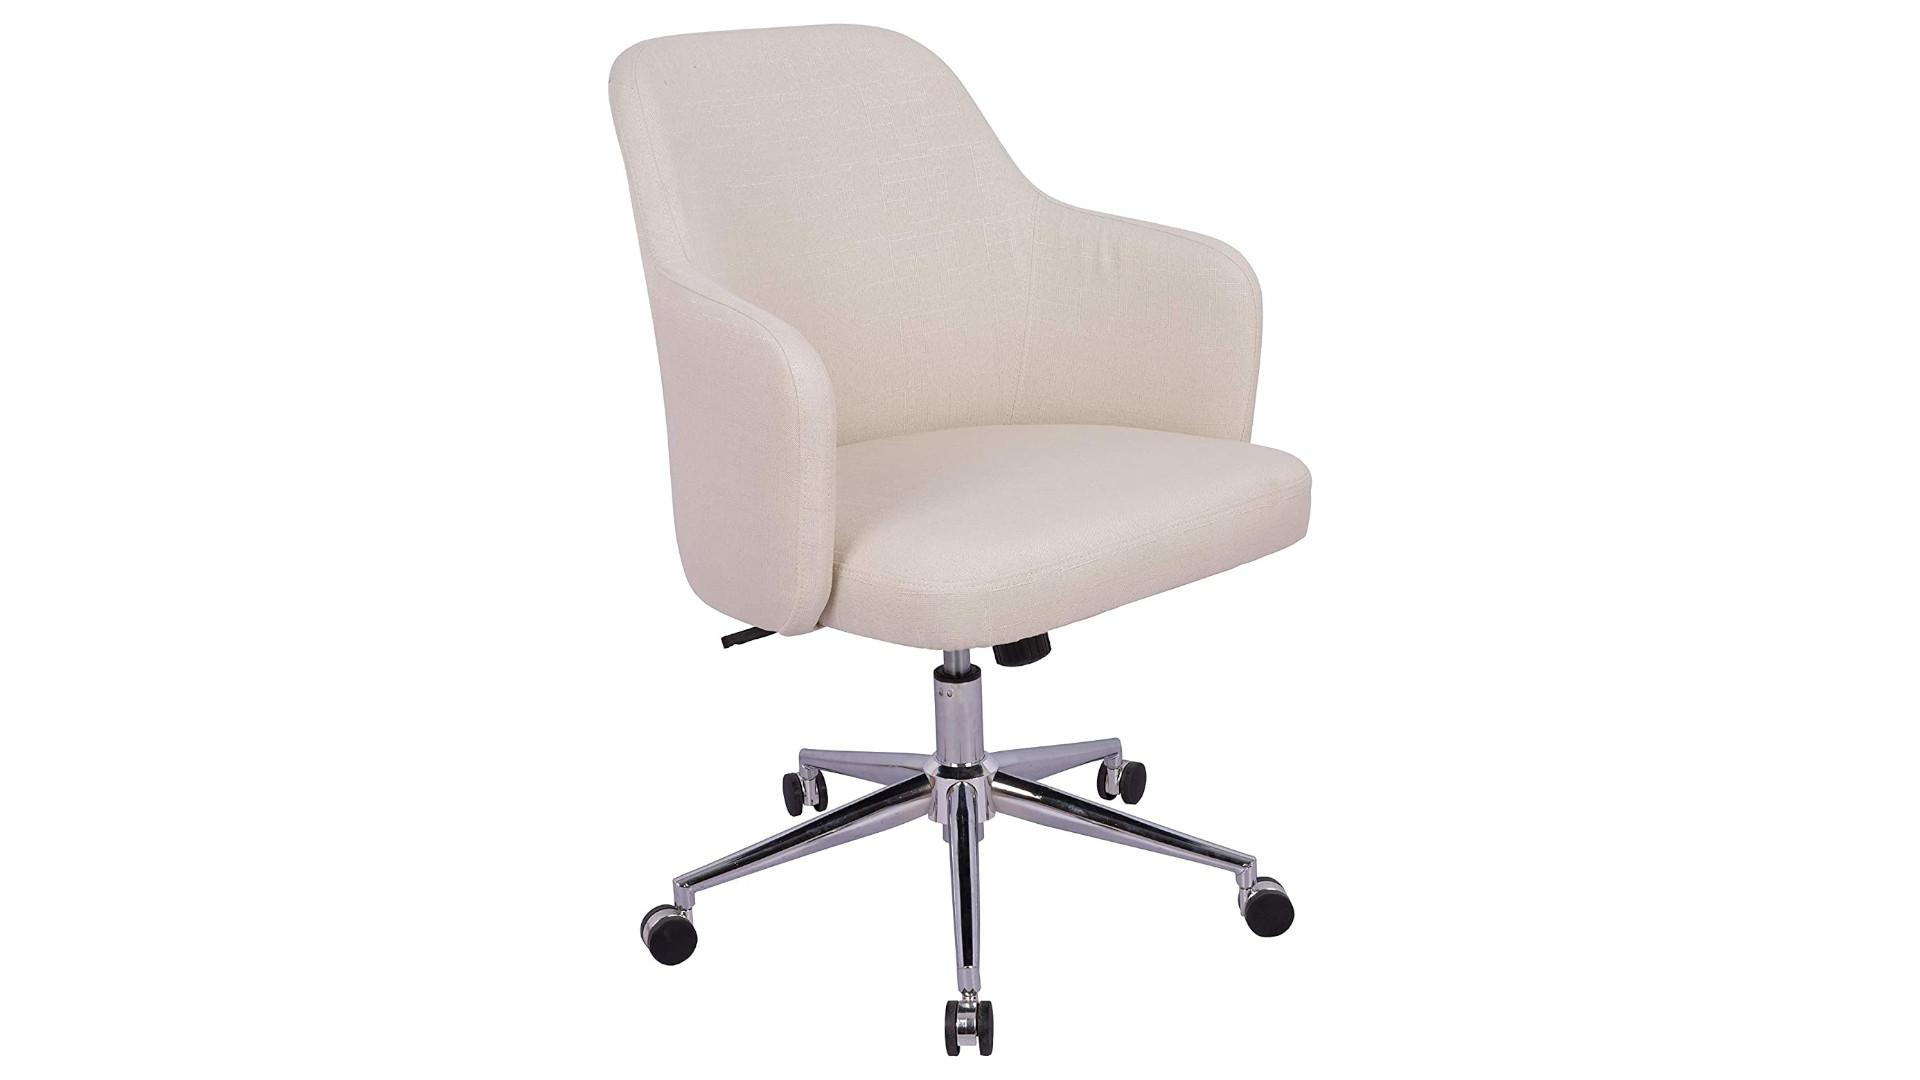 AmazonBasics Classic Office Desk Chair